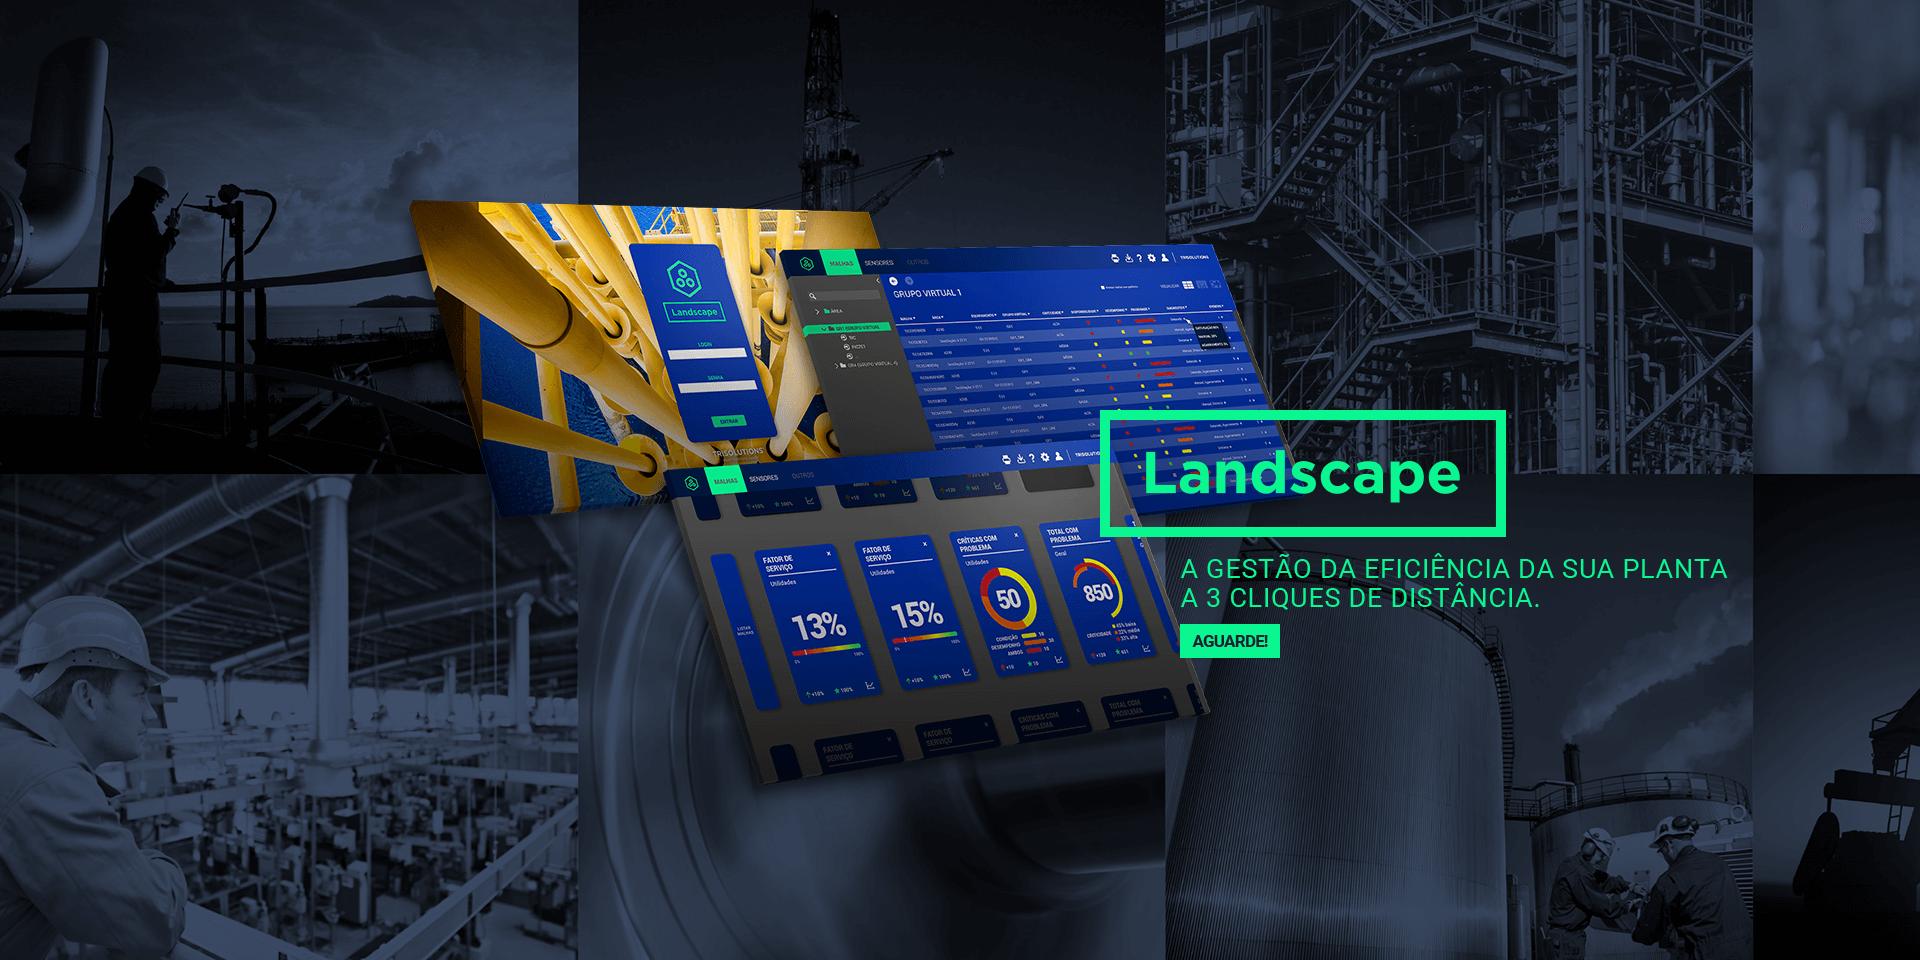 Landscape-capasite1